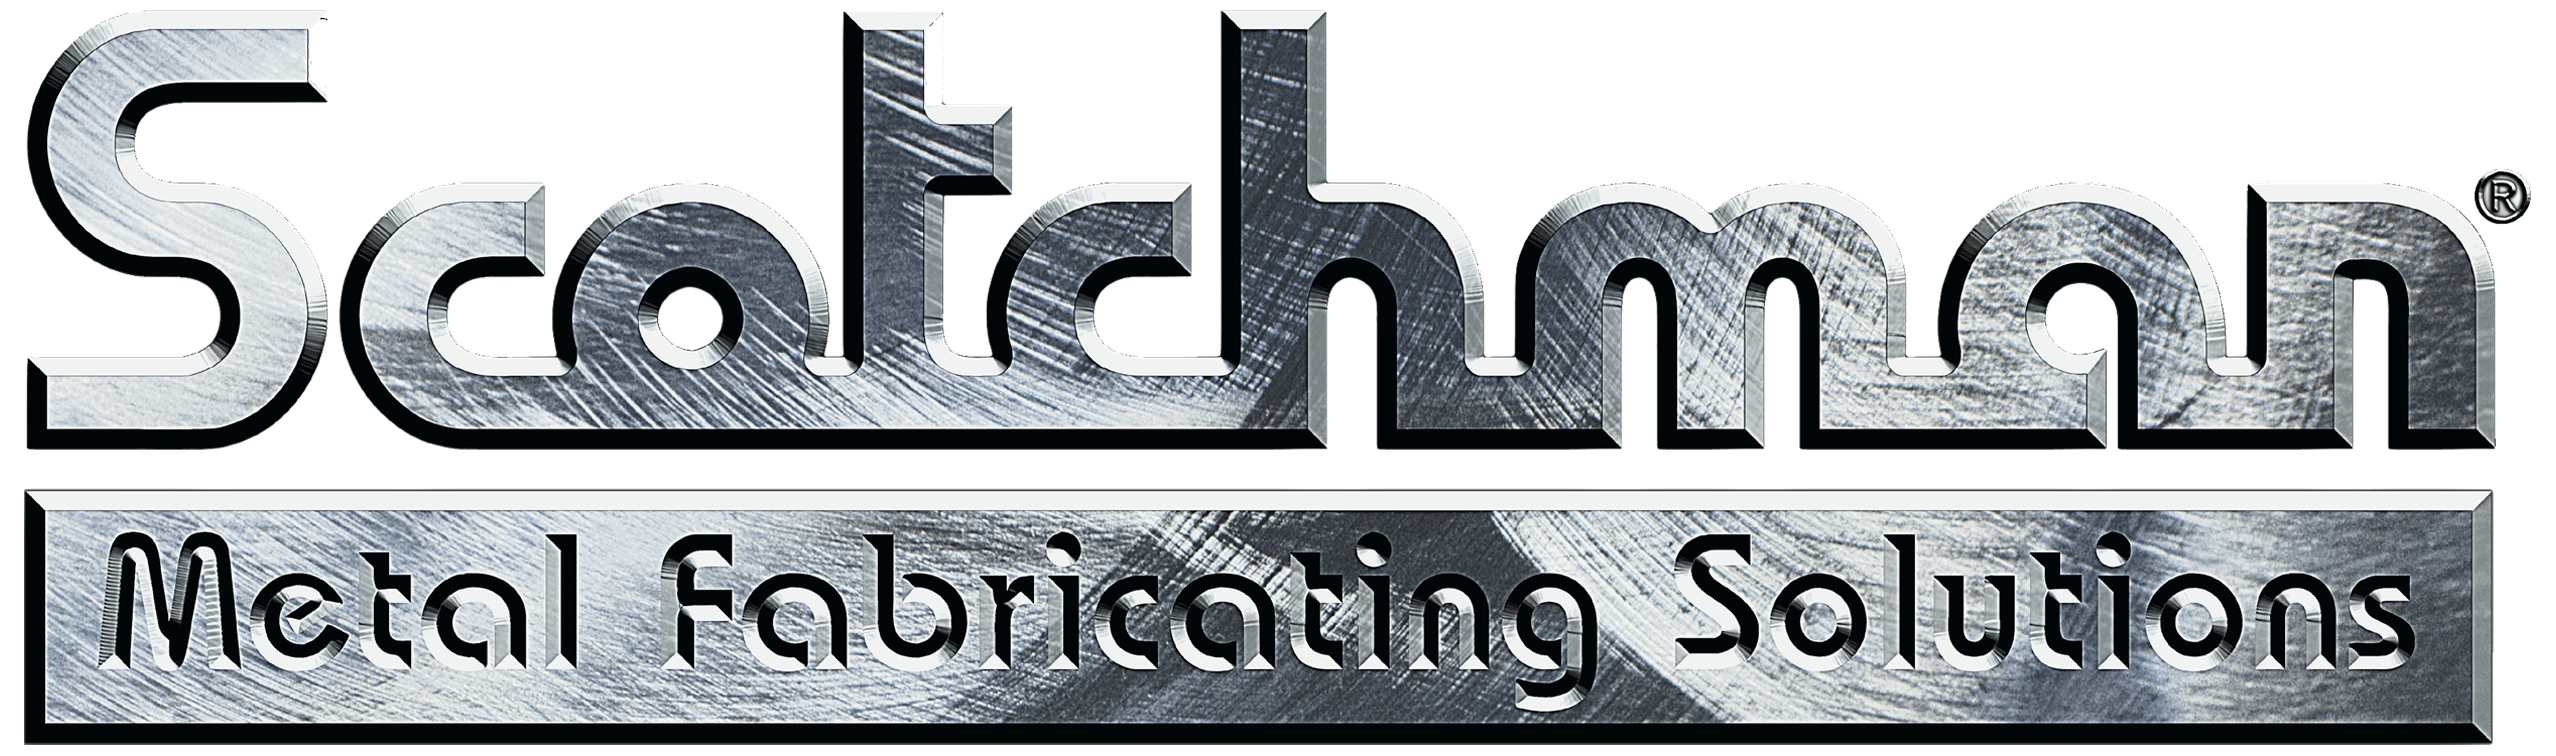 Scotchman-Industries-logo-1